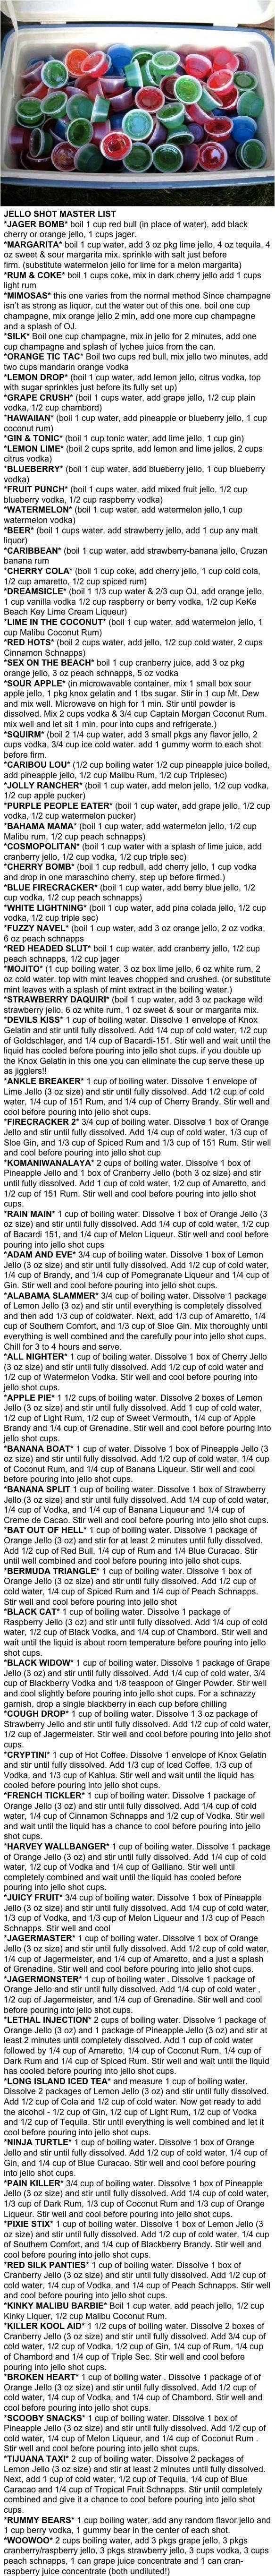 Master list of 70 jello shots. Summer is coming. - Imgur